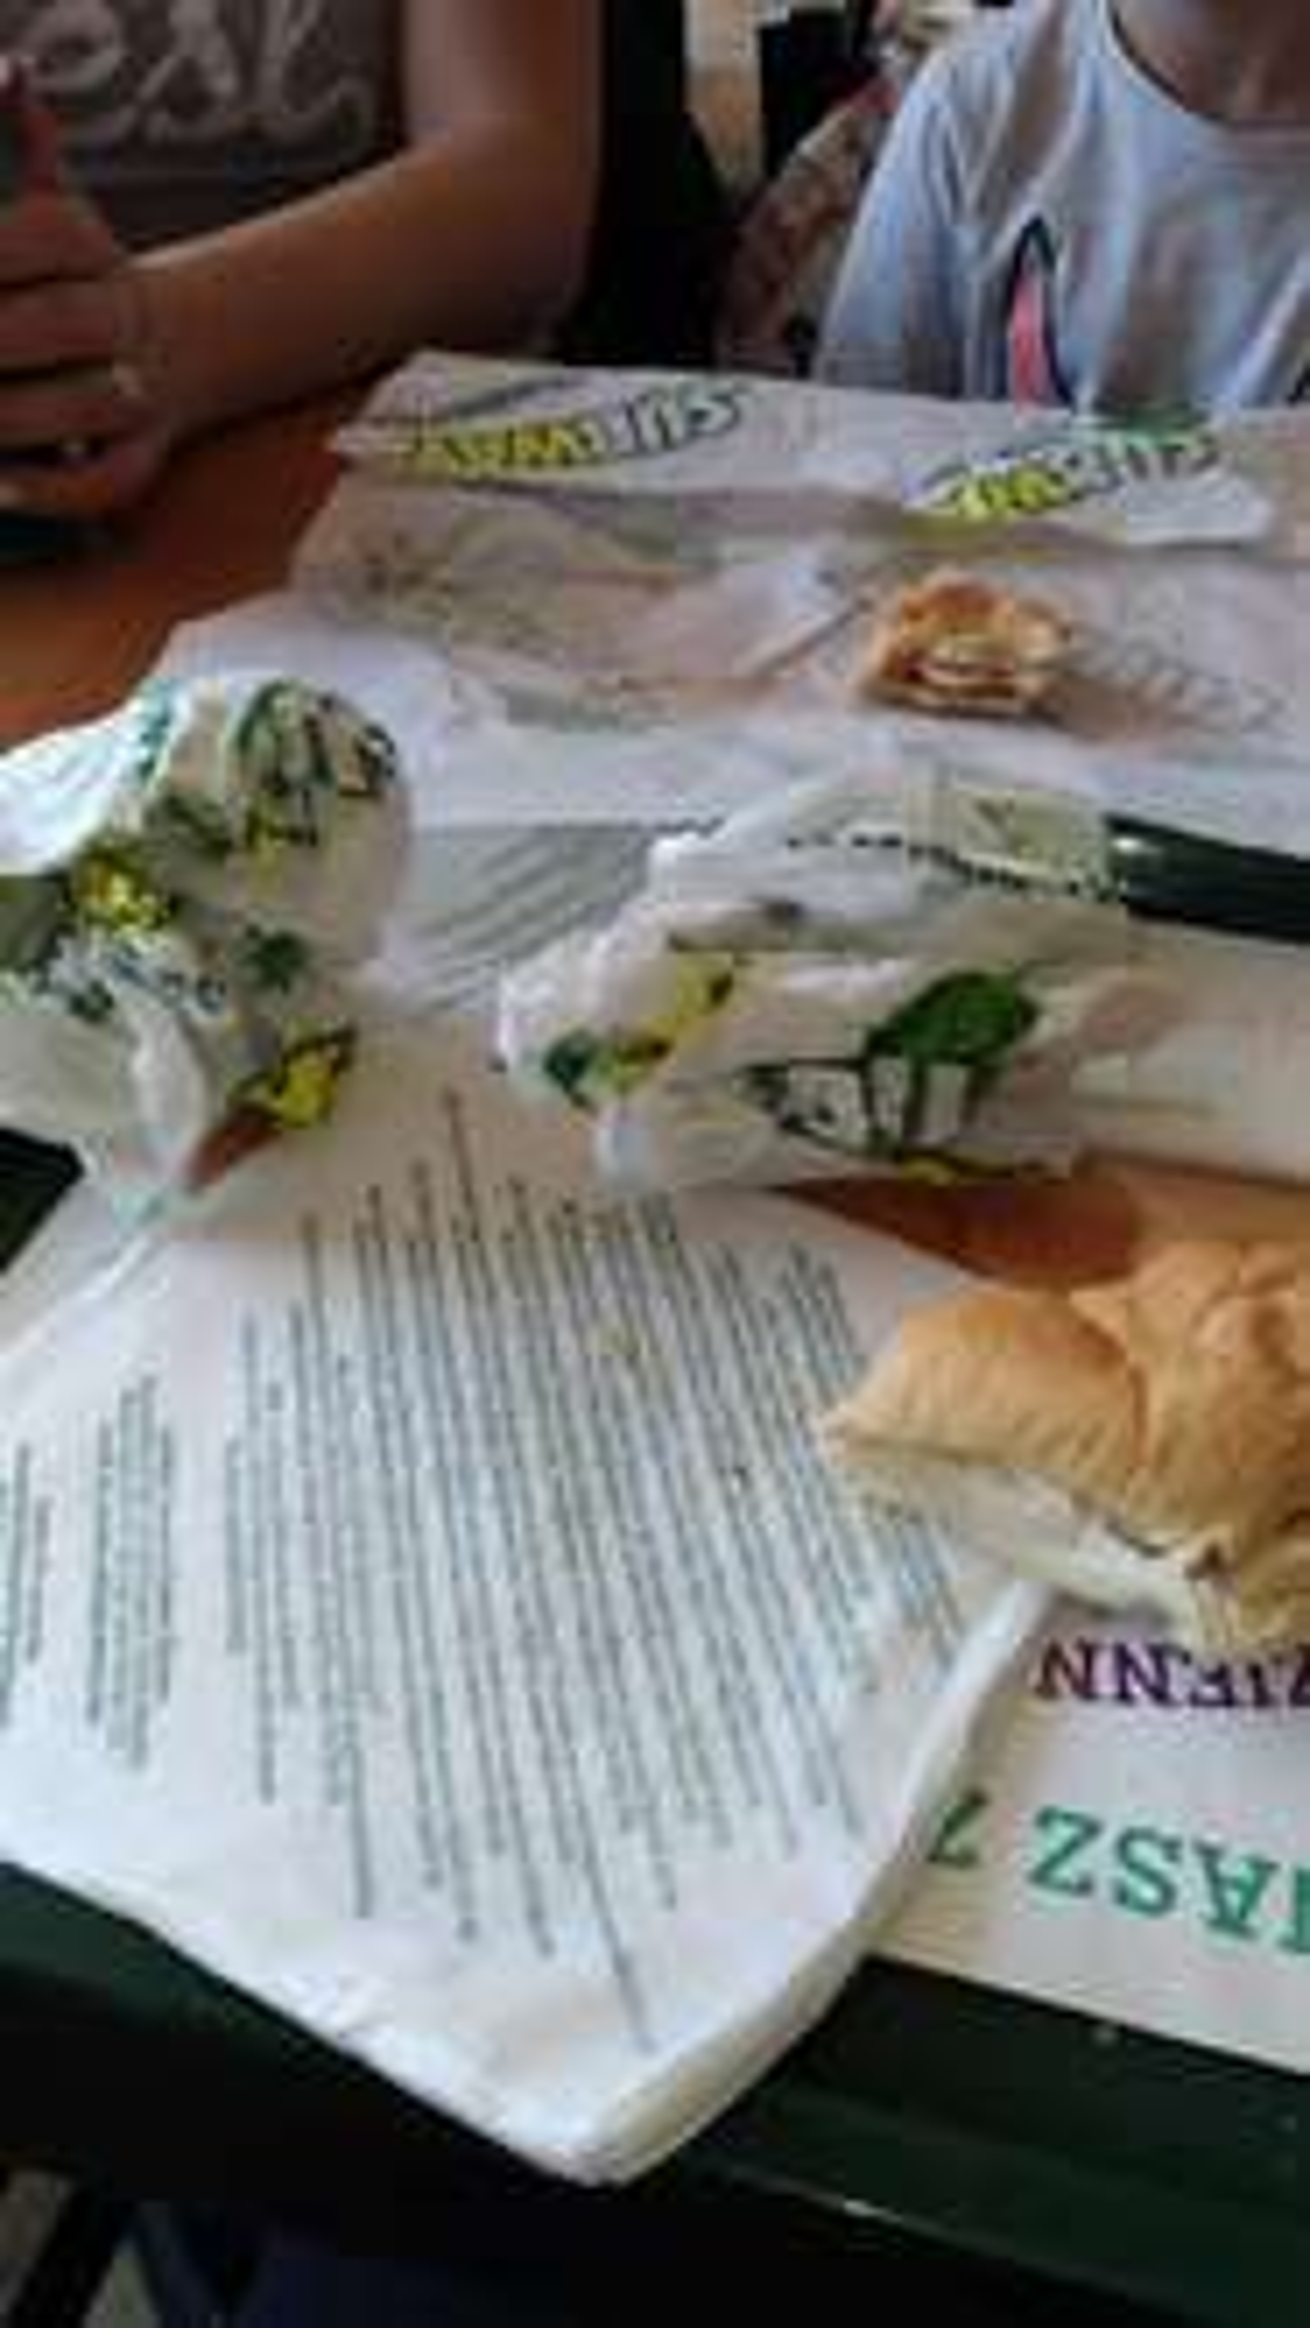 8,99 za 15 cm kanapke i 11,99 za 30 cm kanapkę, dodatkowo dolewka w Subwayu @Groupon